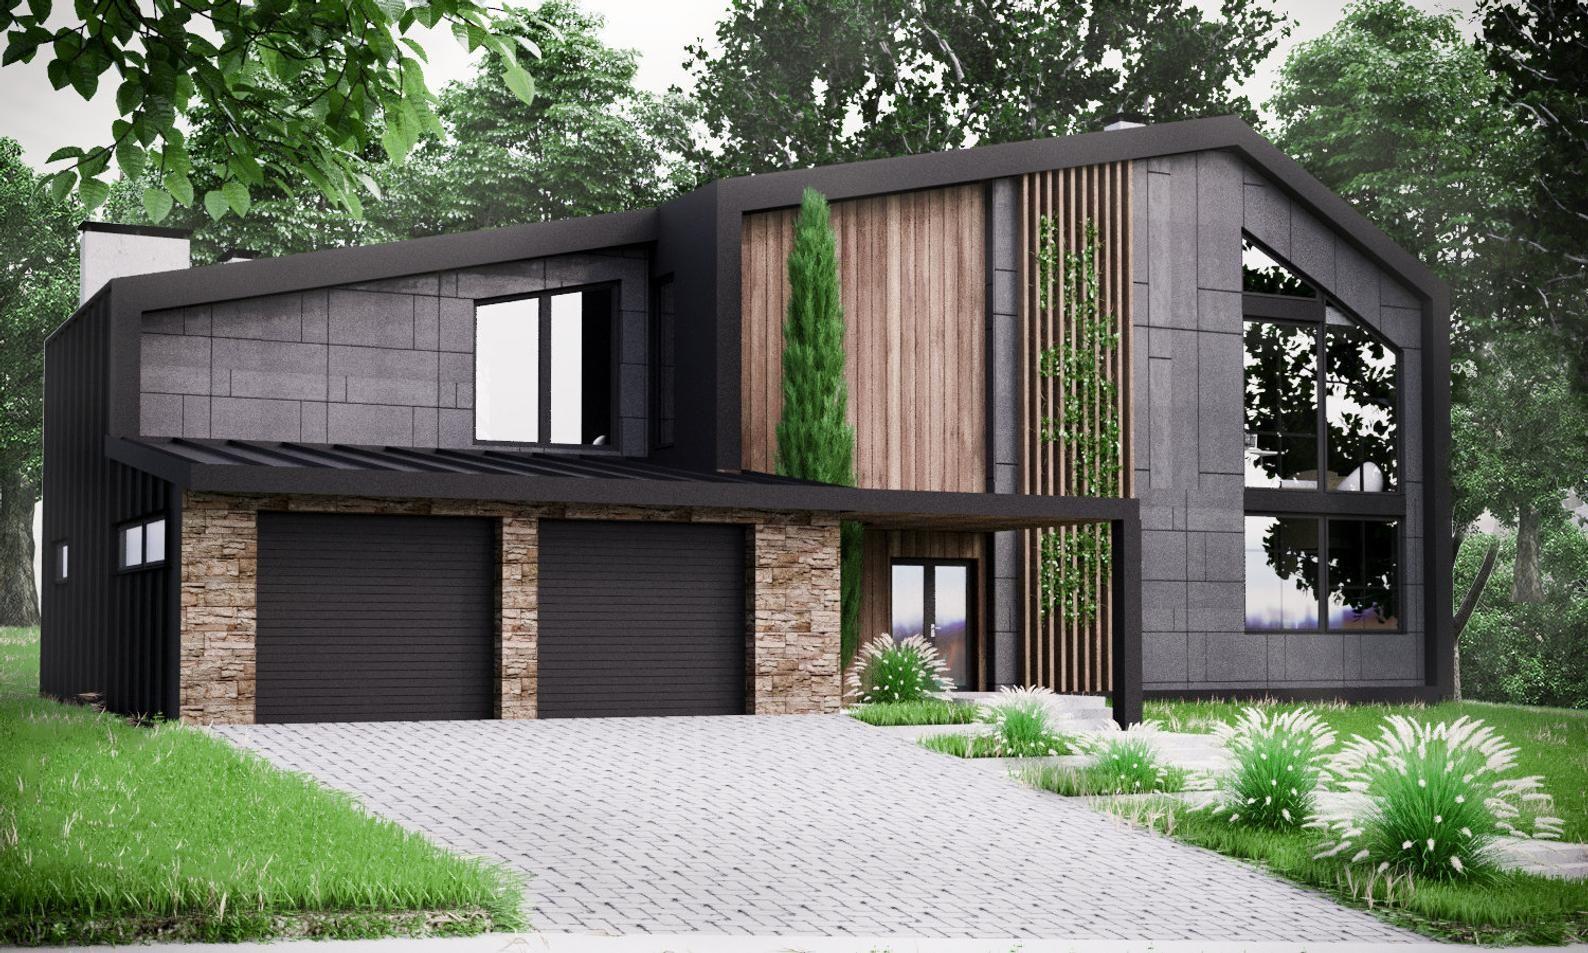 Modern House Plan Building Plans Blueprints & Material List 2018 306 m #2